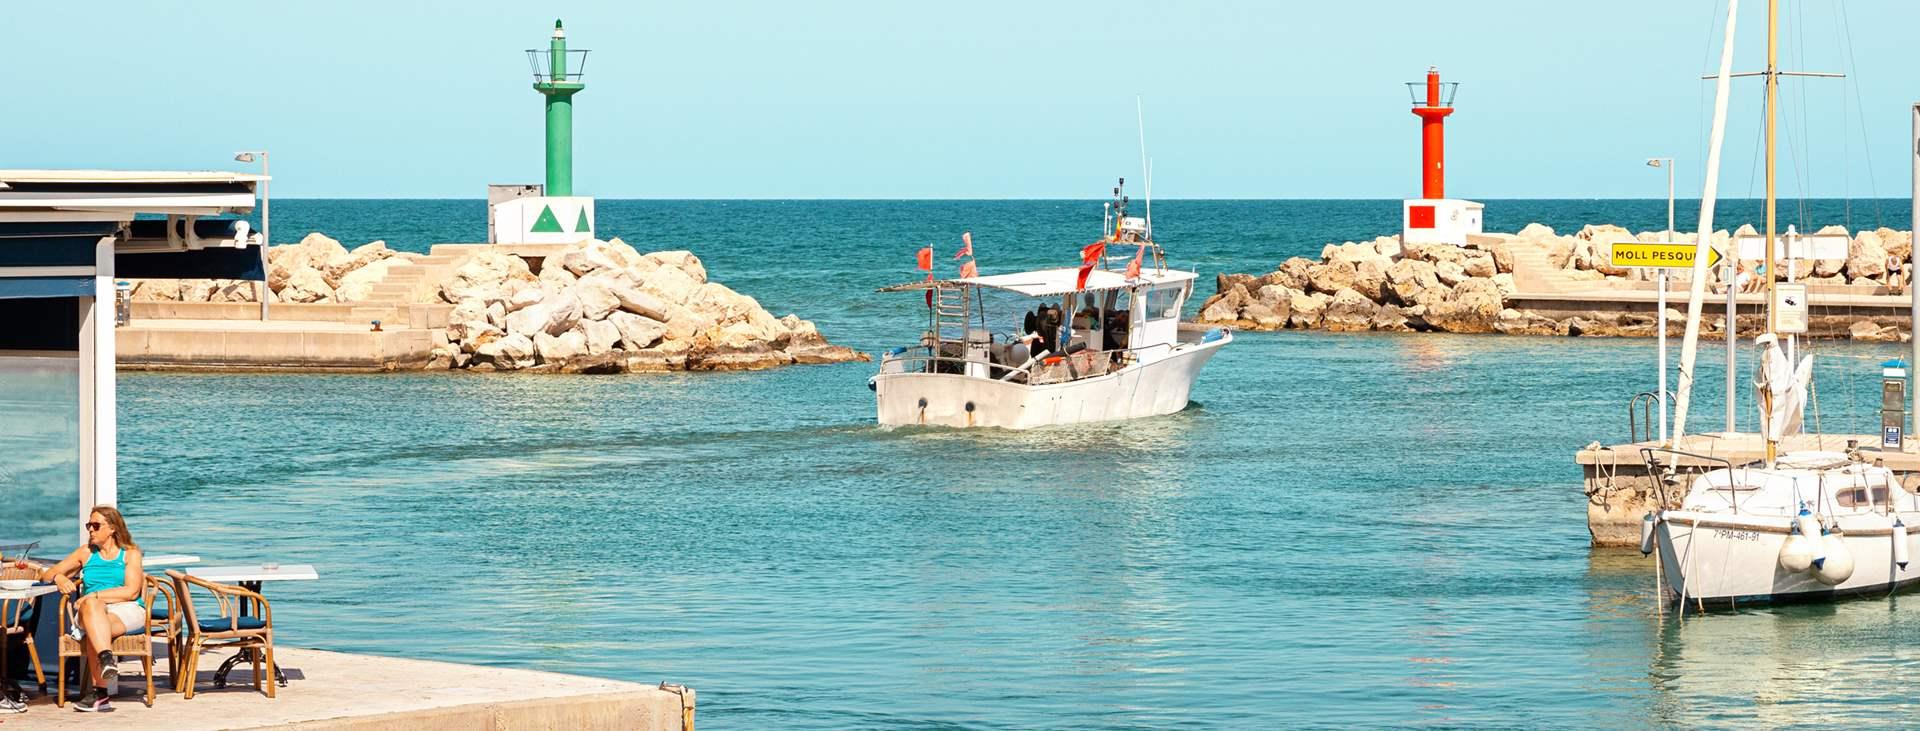 Boka en resa med All Inclusive till Cala Bona på Mallorca